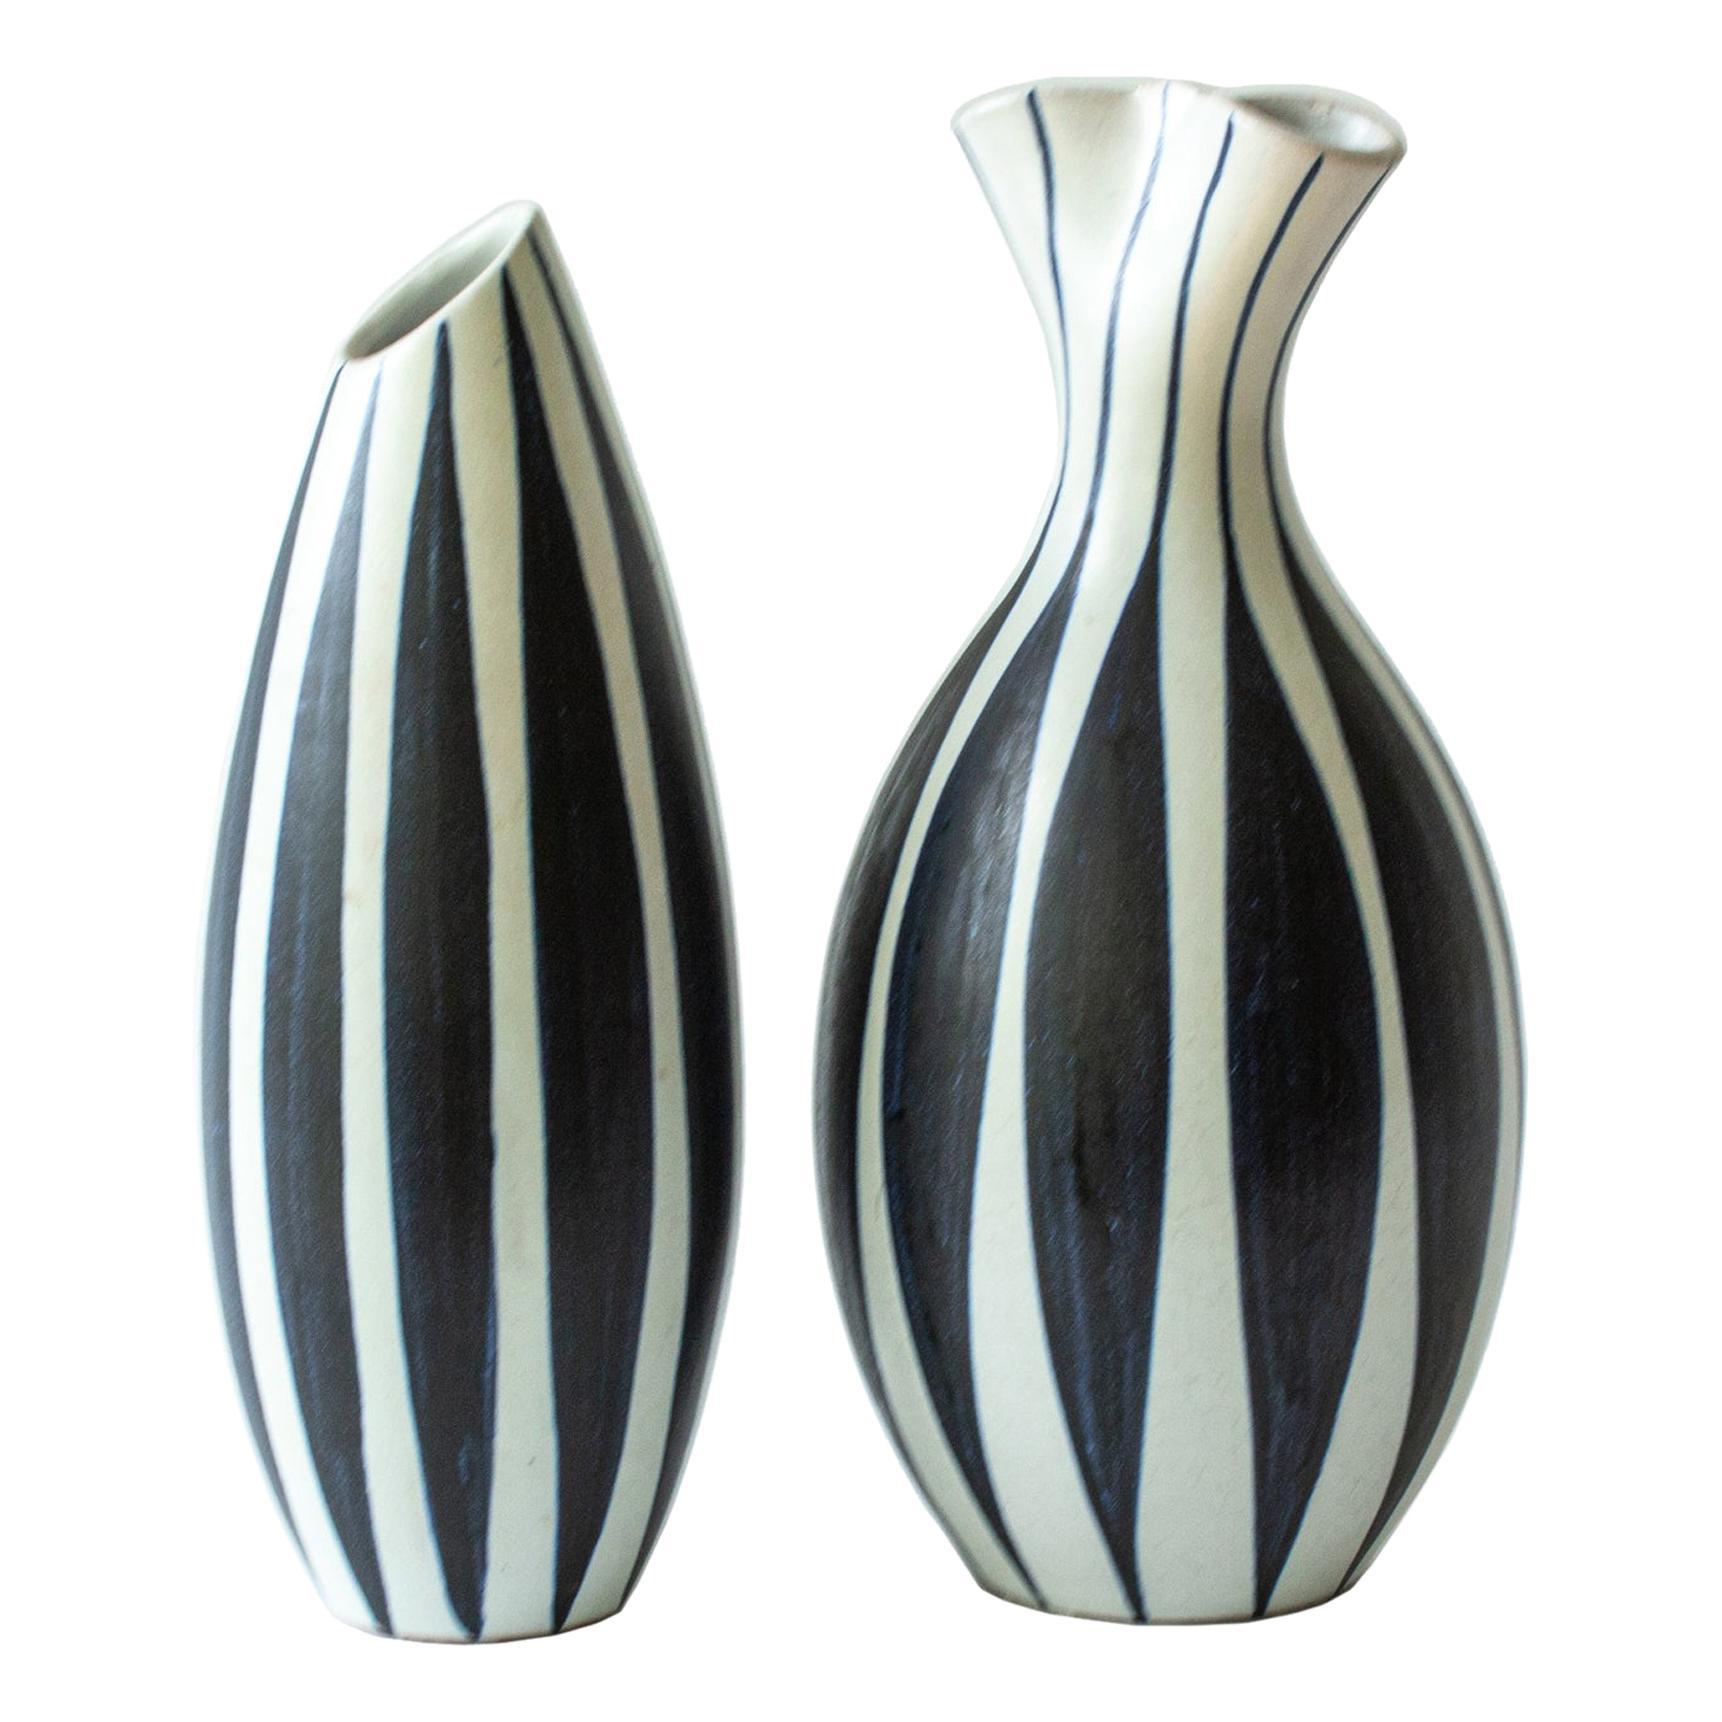 Pair of Scandinavian Modern Striped Vases by Mette Doller for Hoganas, 'Höganäs'